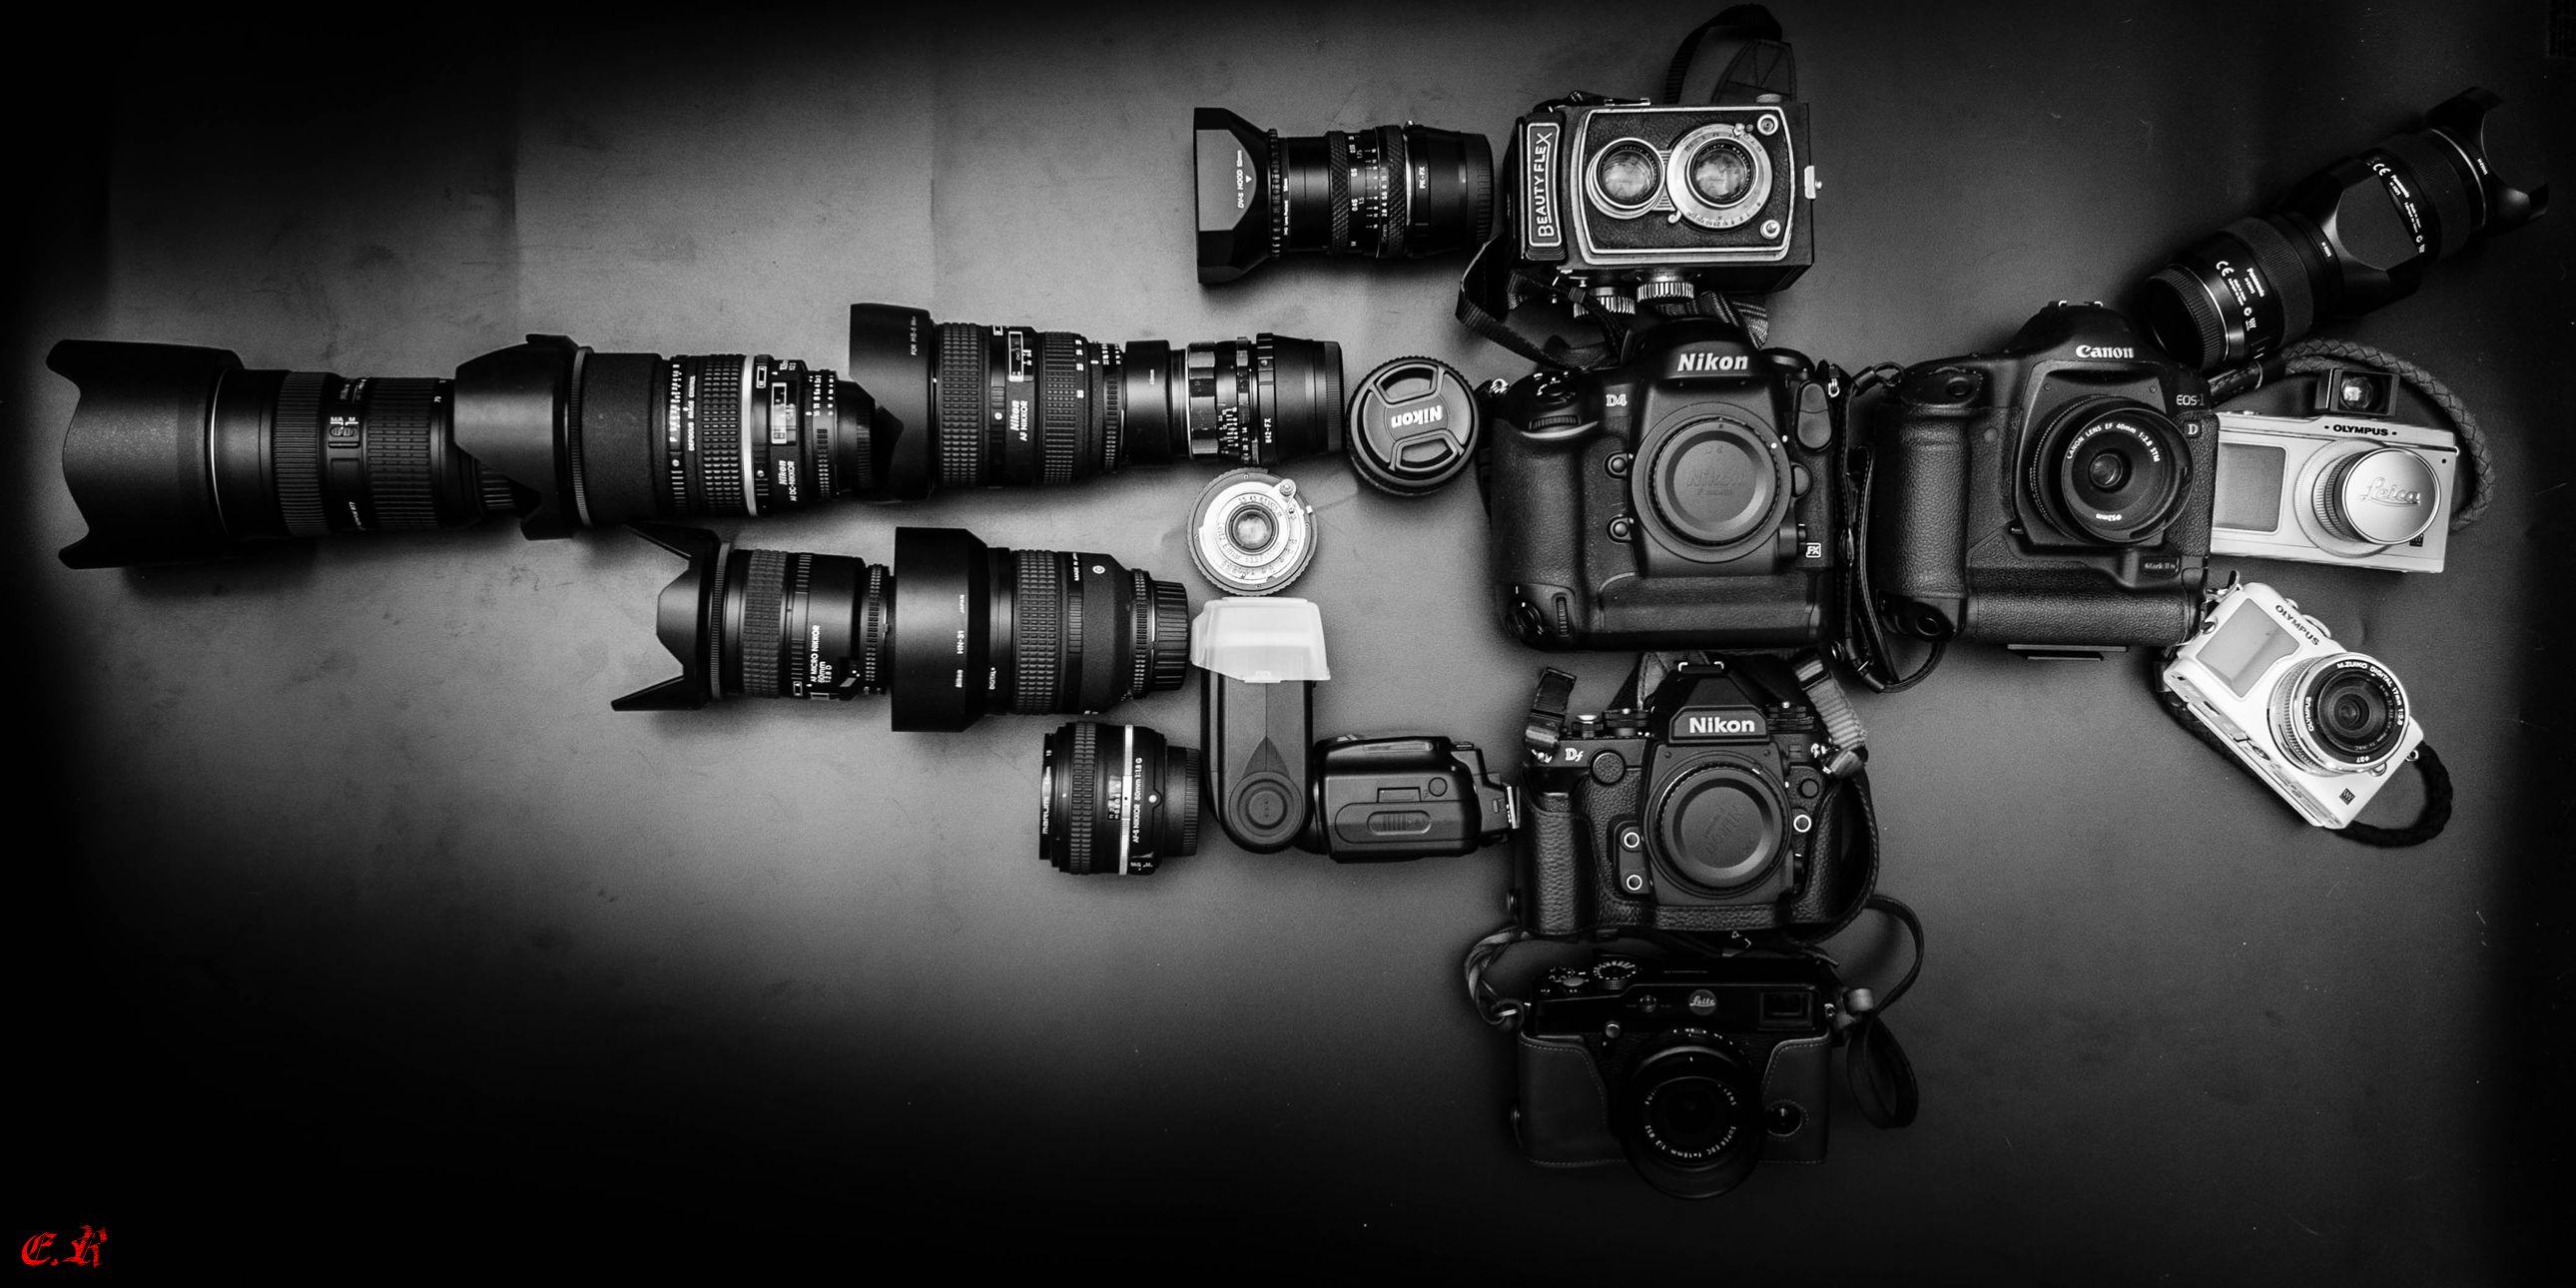 Wallpaper Canon Nikon Stm Leica 35mm N Pentax Olympus Panasonic Dg Macro Elmarit 45mm F 28 Asph R F14 Dc 85mm Color F28 Nikkor 50mm G Mark Ii F18 Micro F35 Df